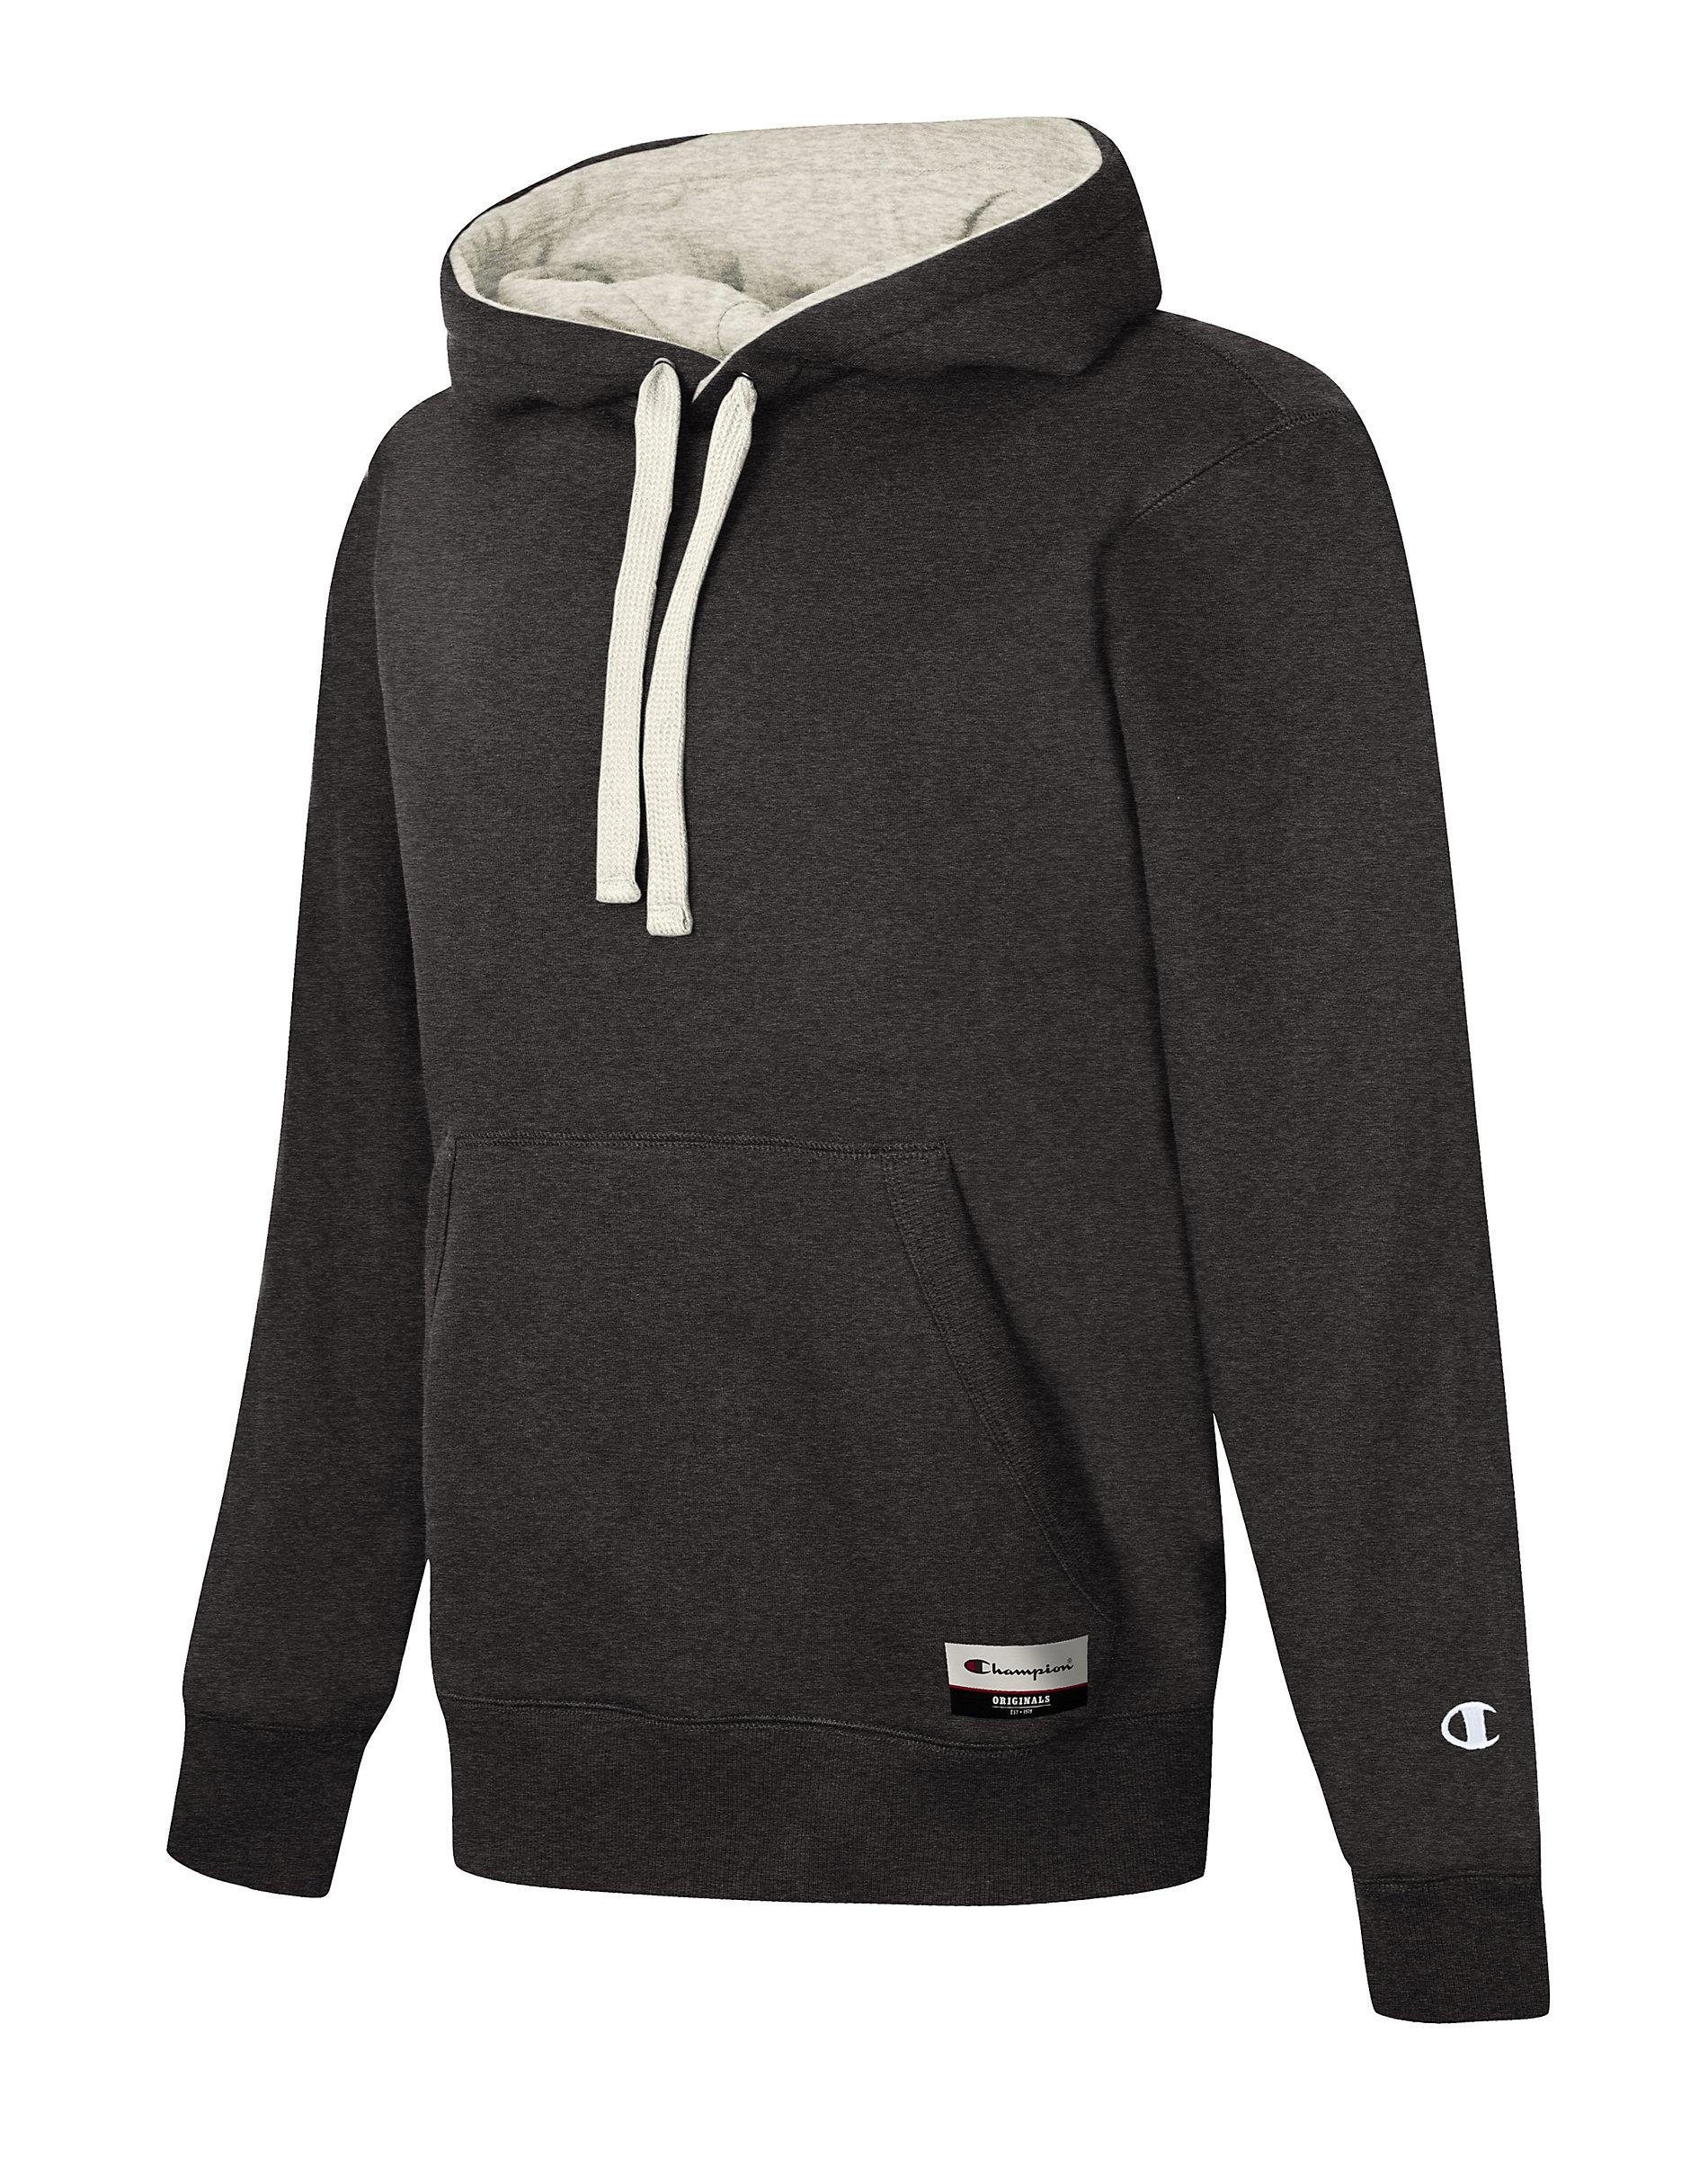 Champion Hoodie Sweatshirt Womens Fleece Powerblend Pullover Kango Pockets Scuba